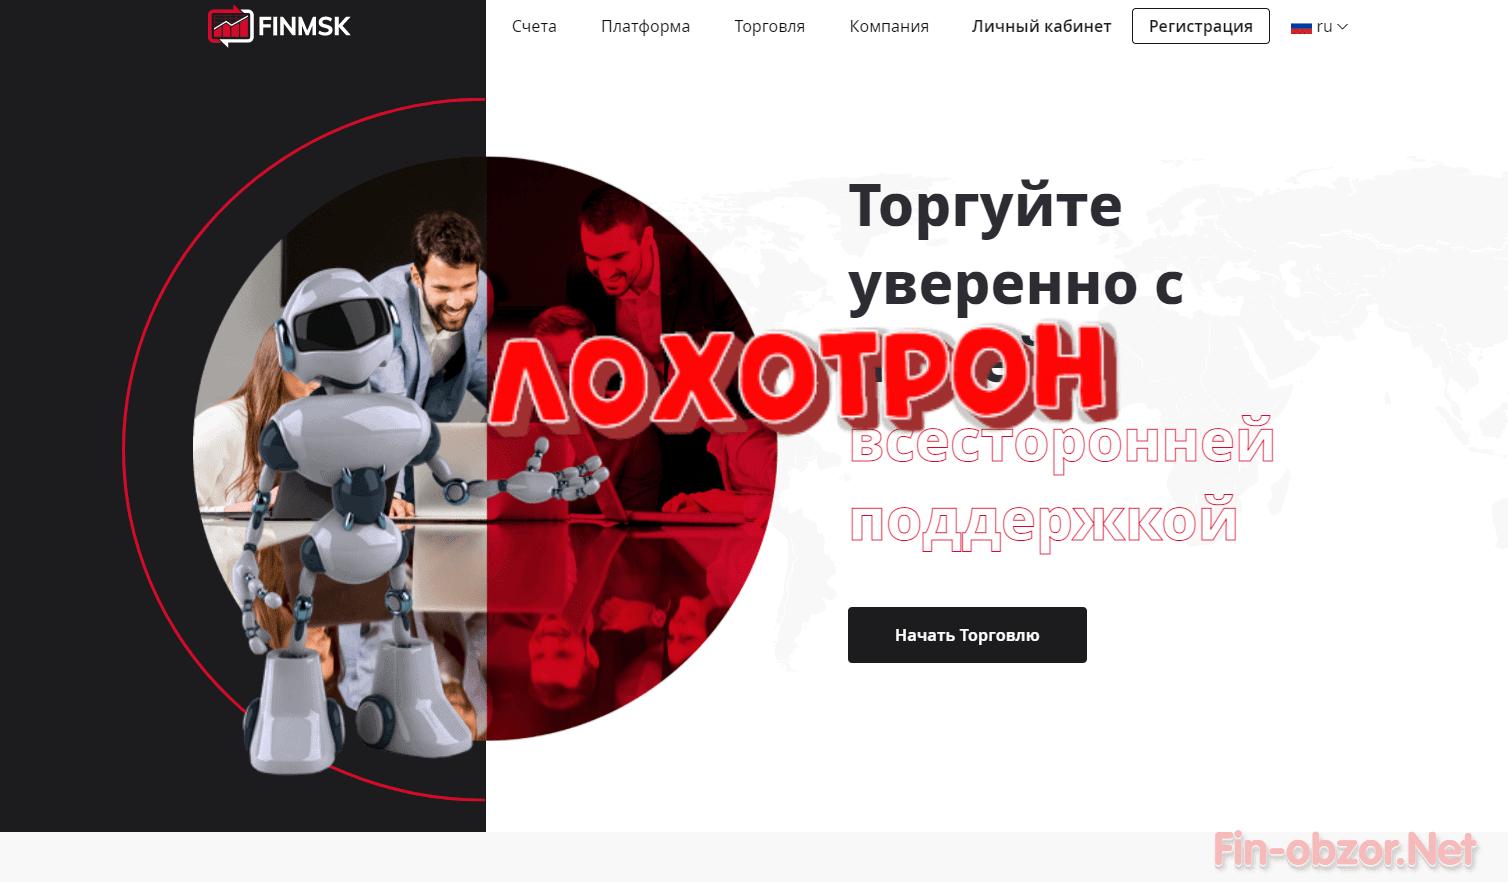 finmsk com что за компания